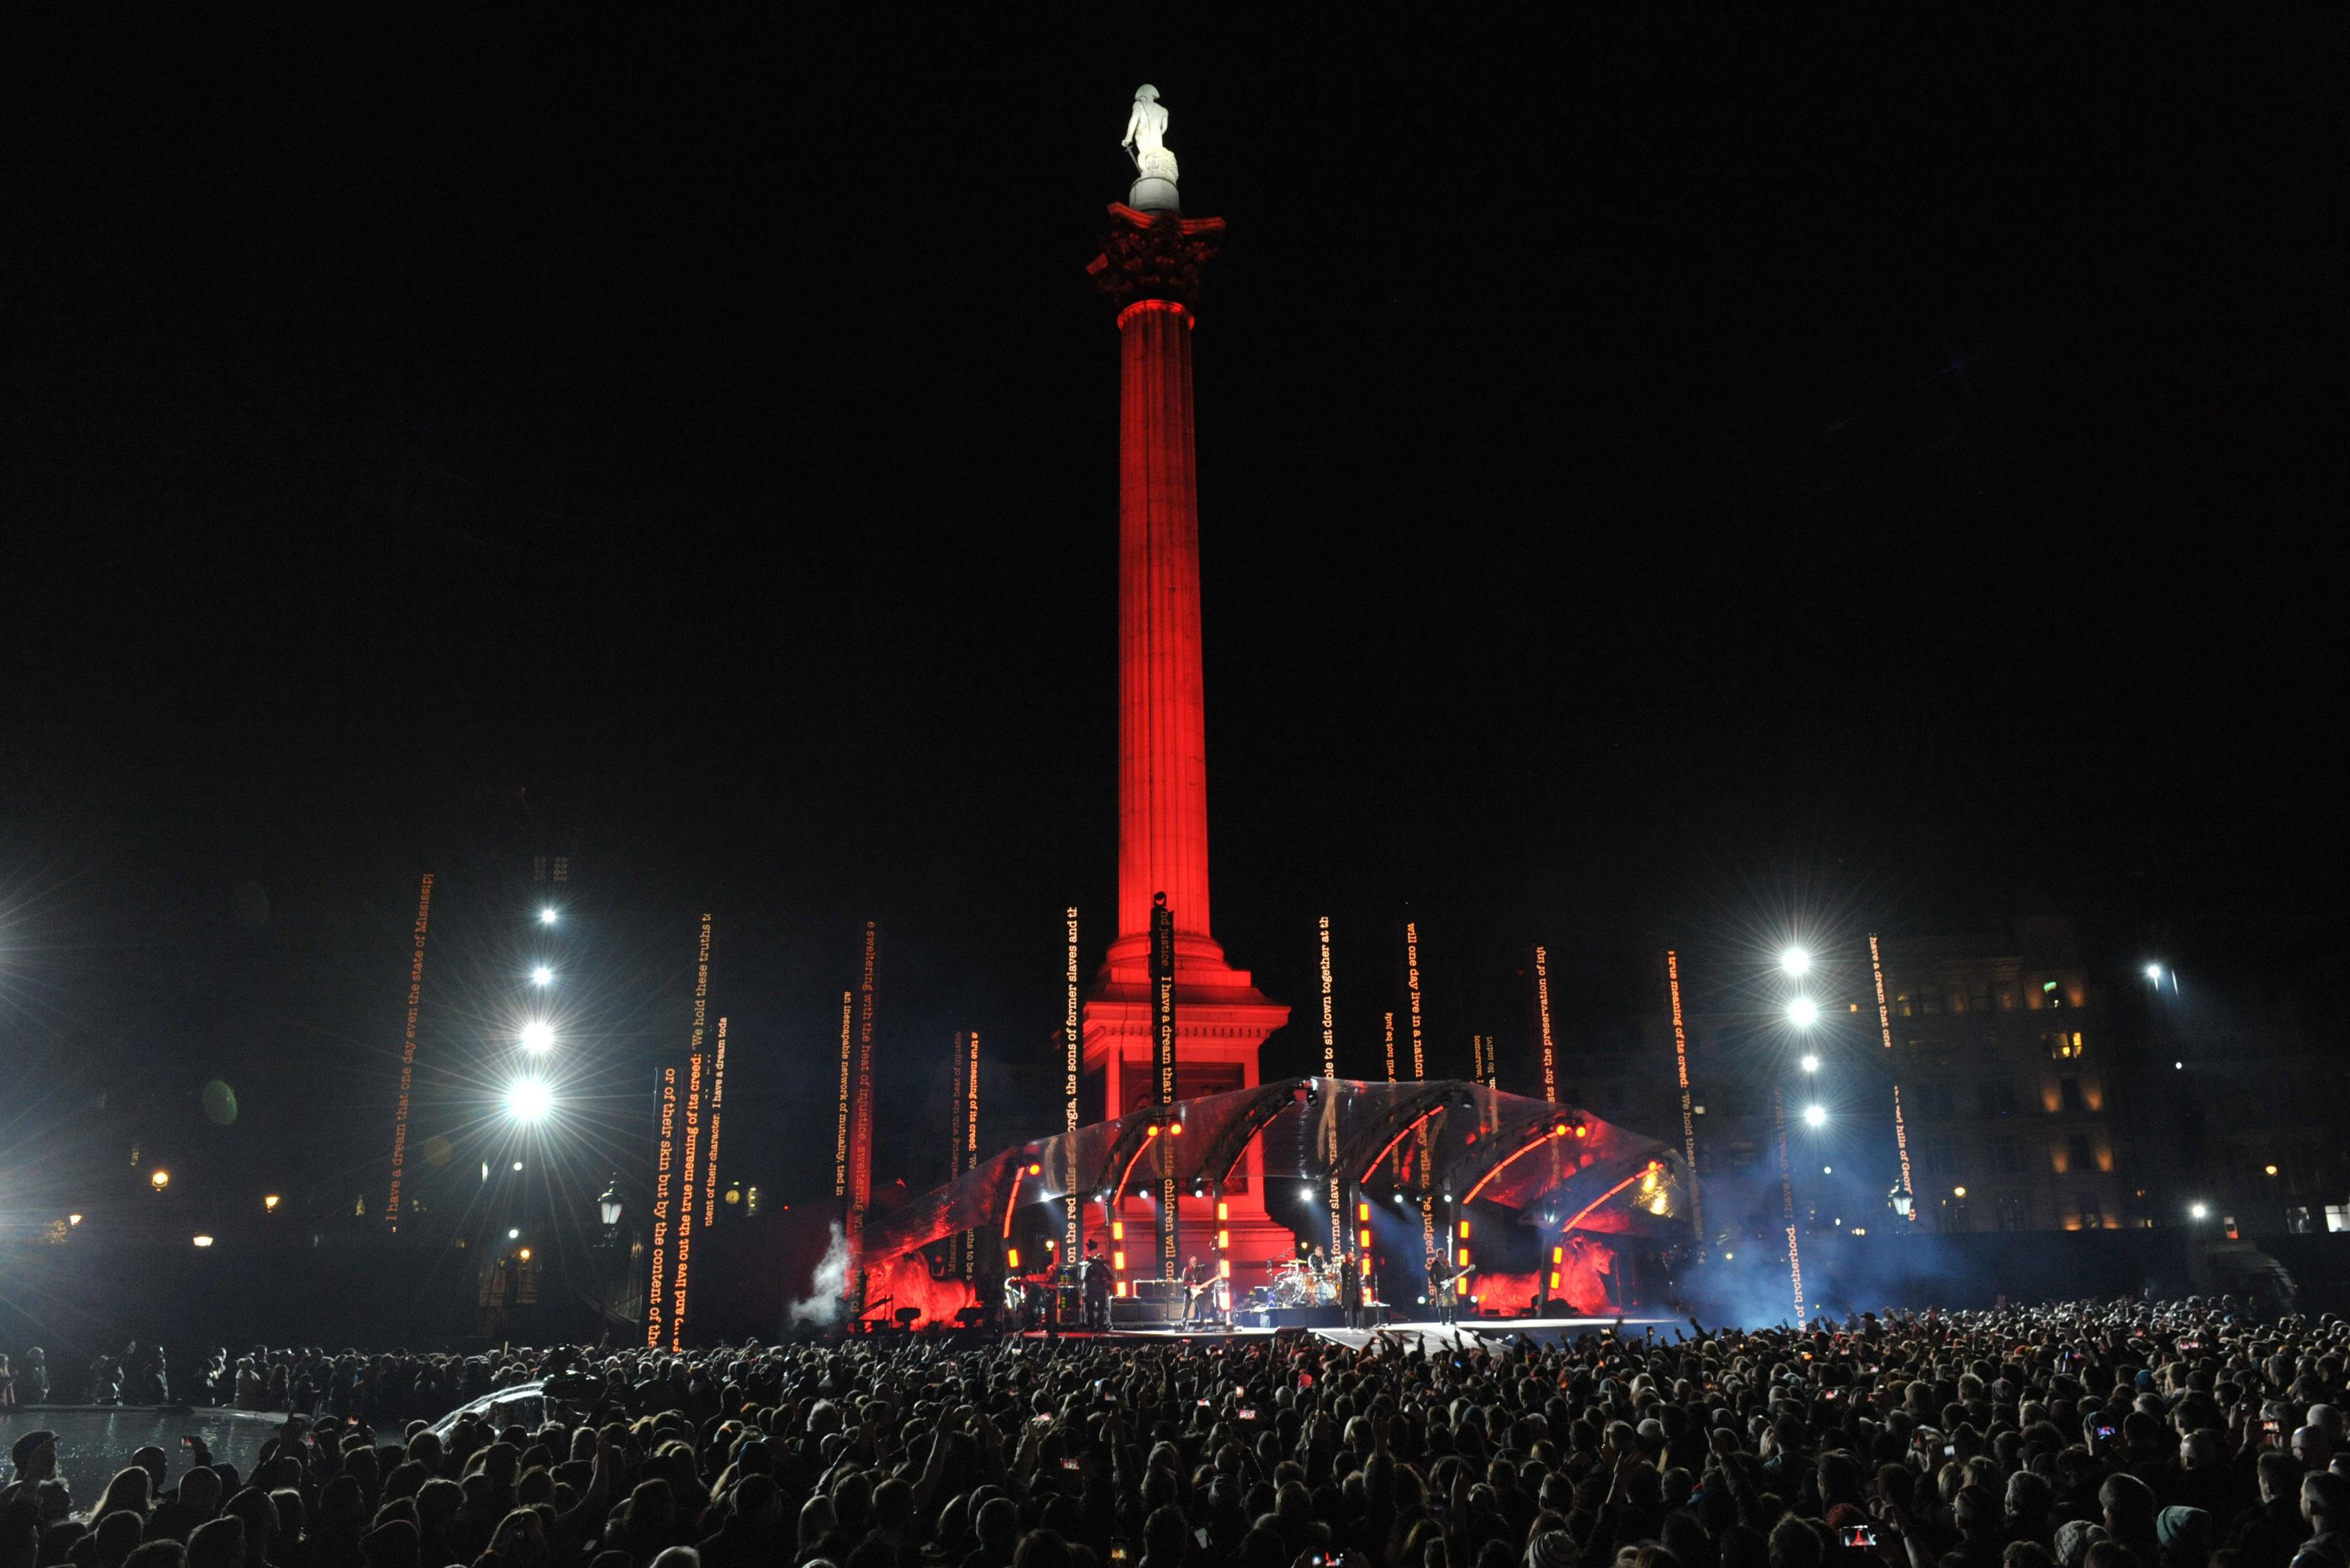 U2 Trafalgar Square Gig